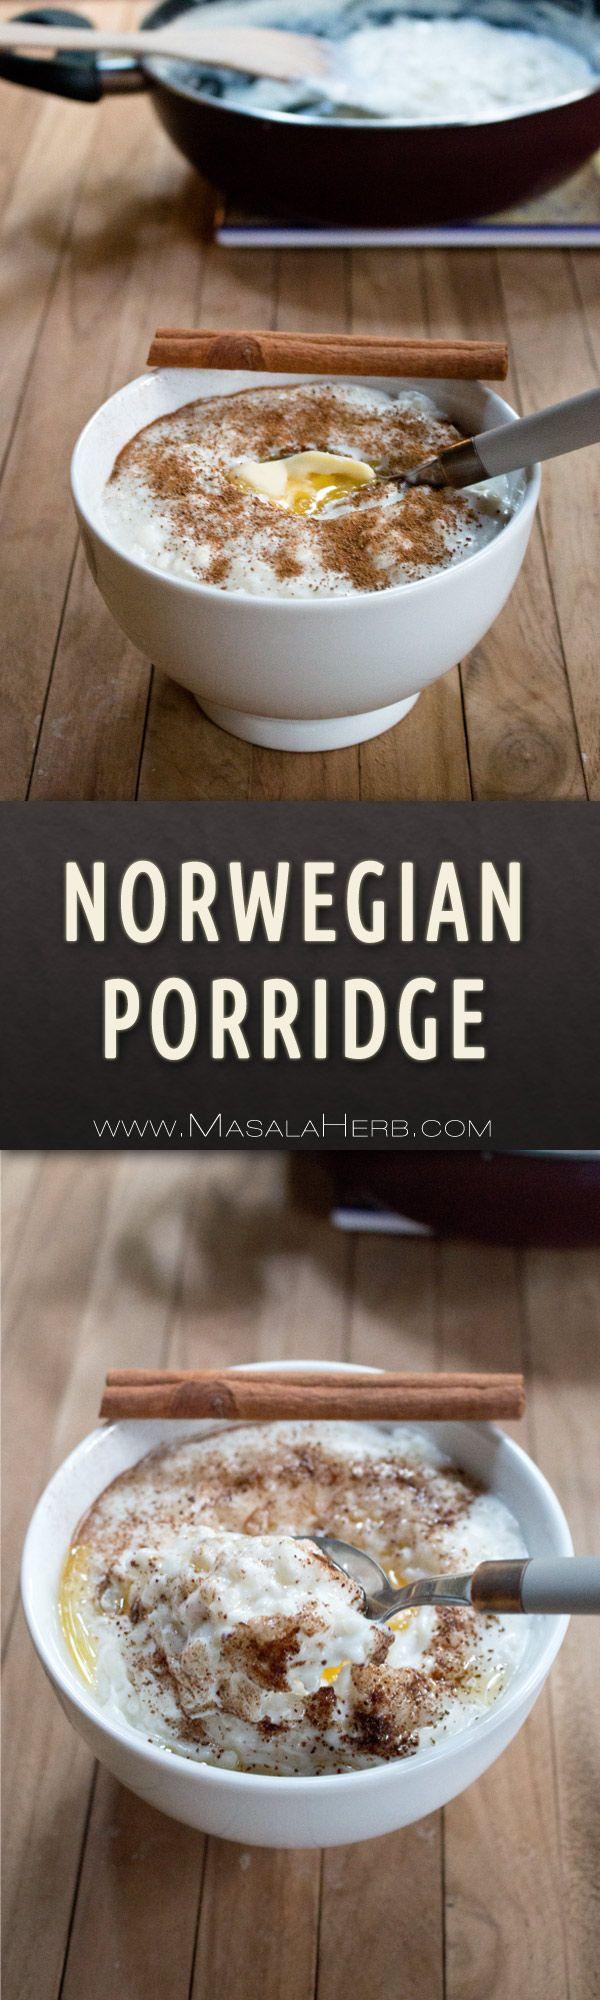 Norwegian Porridge Recipe - Risengrynsgrøt - One-Pot Rice Porridge [+Video] scandinavian christmas meal & healthier all year round breakfast dish made with rice and milk as main ingredients. www.MasalaHerb.com #porridge #rice #masalaherb #norwegian